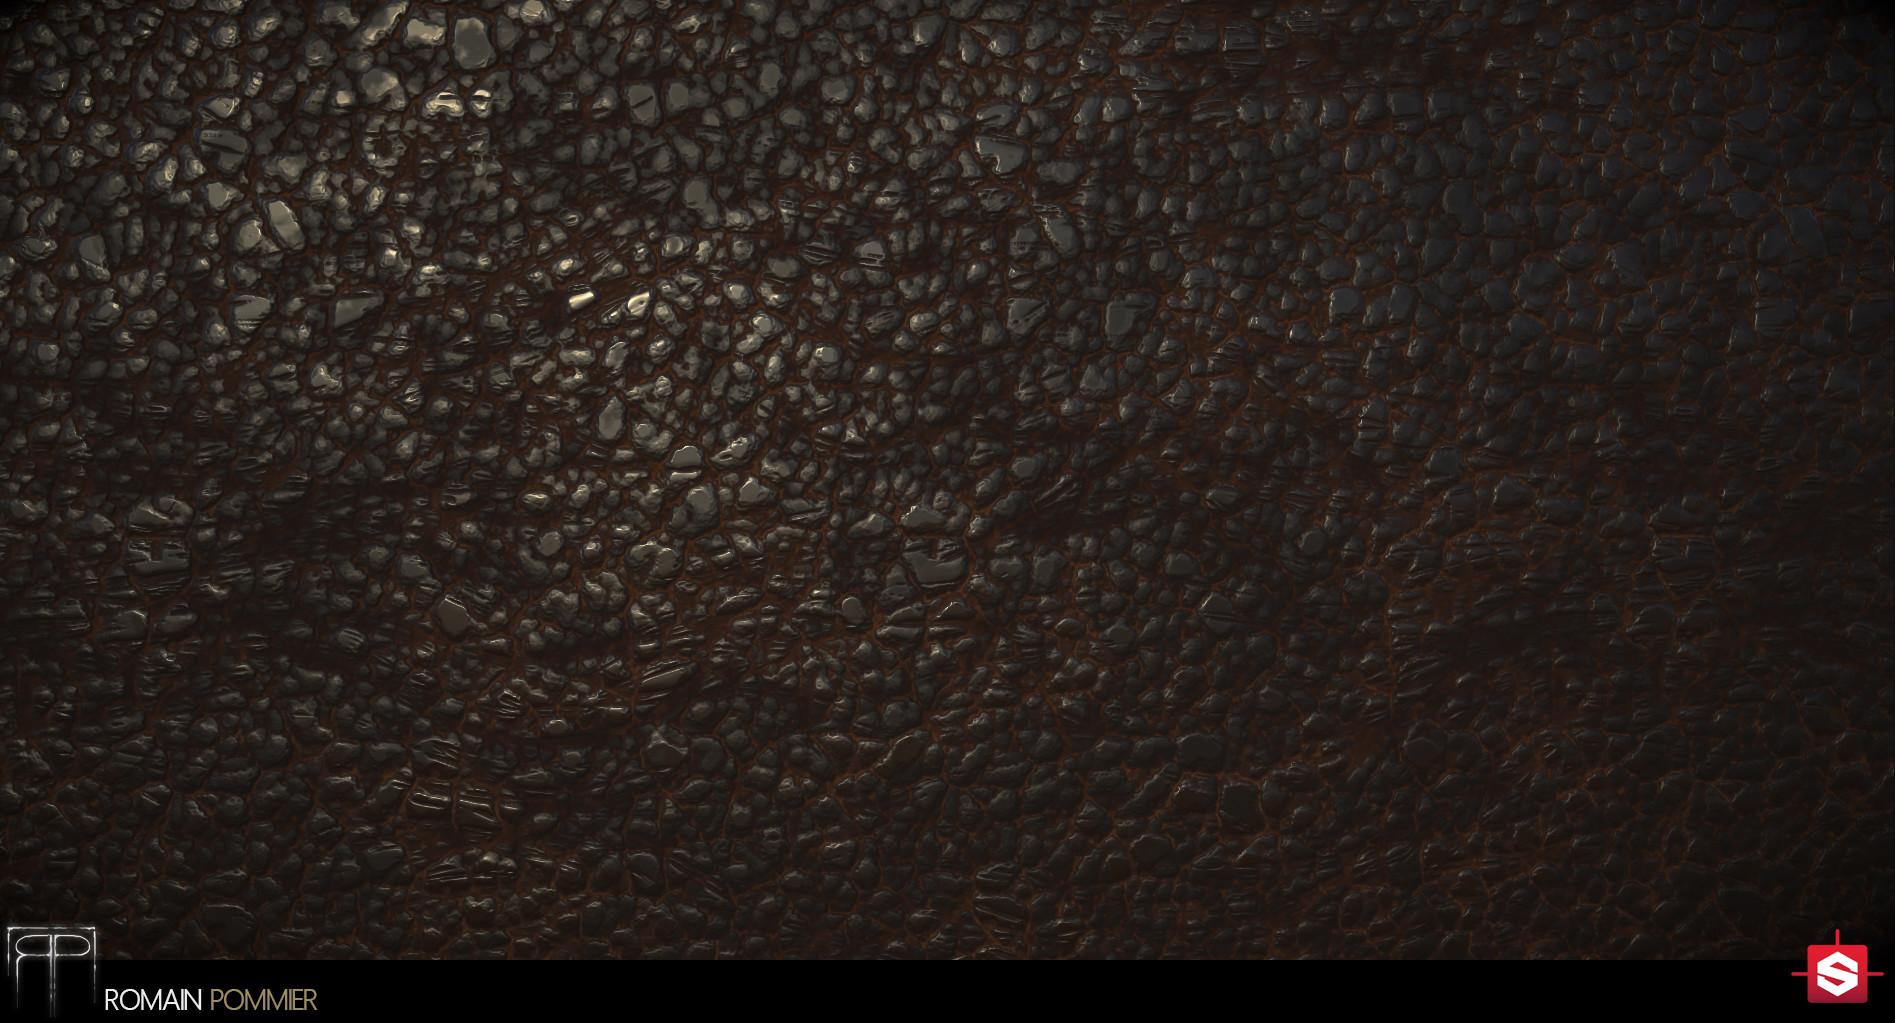 Romain pommier leather